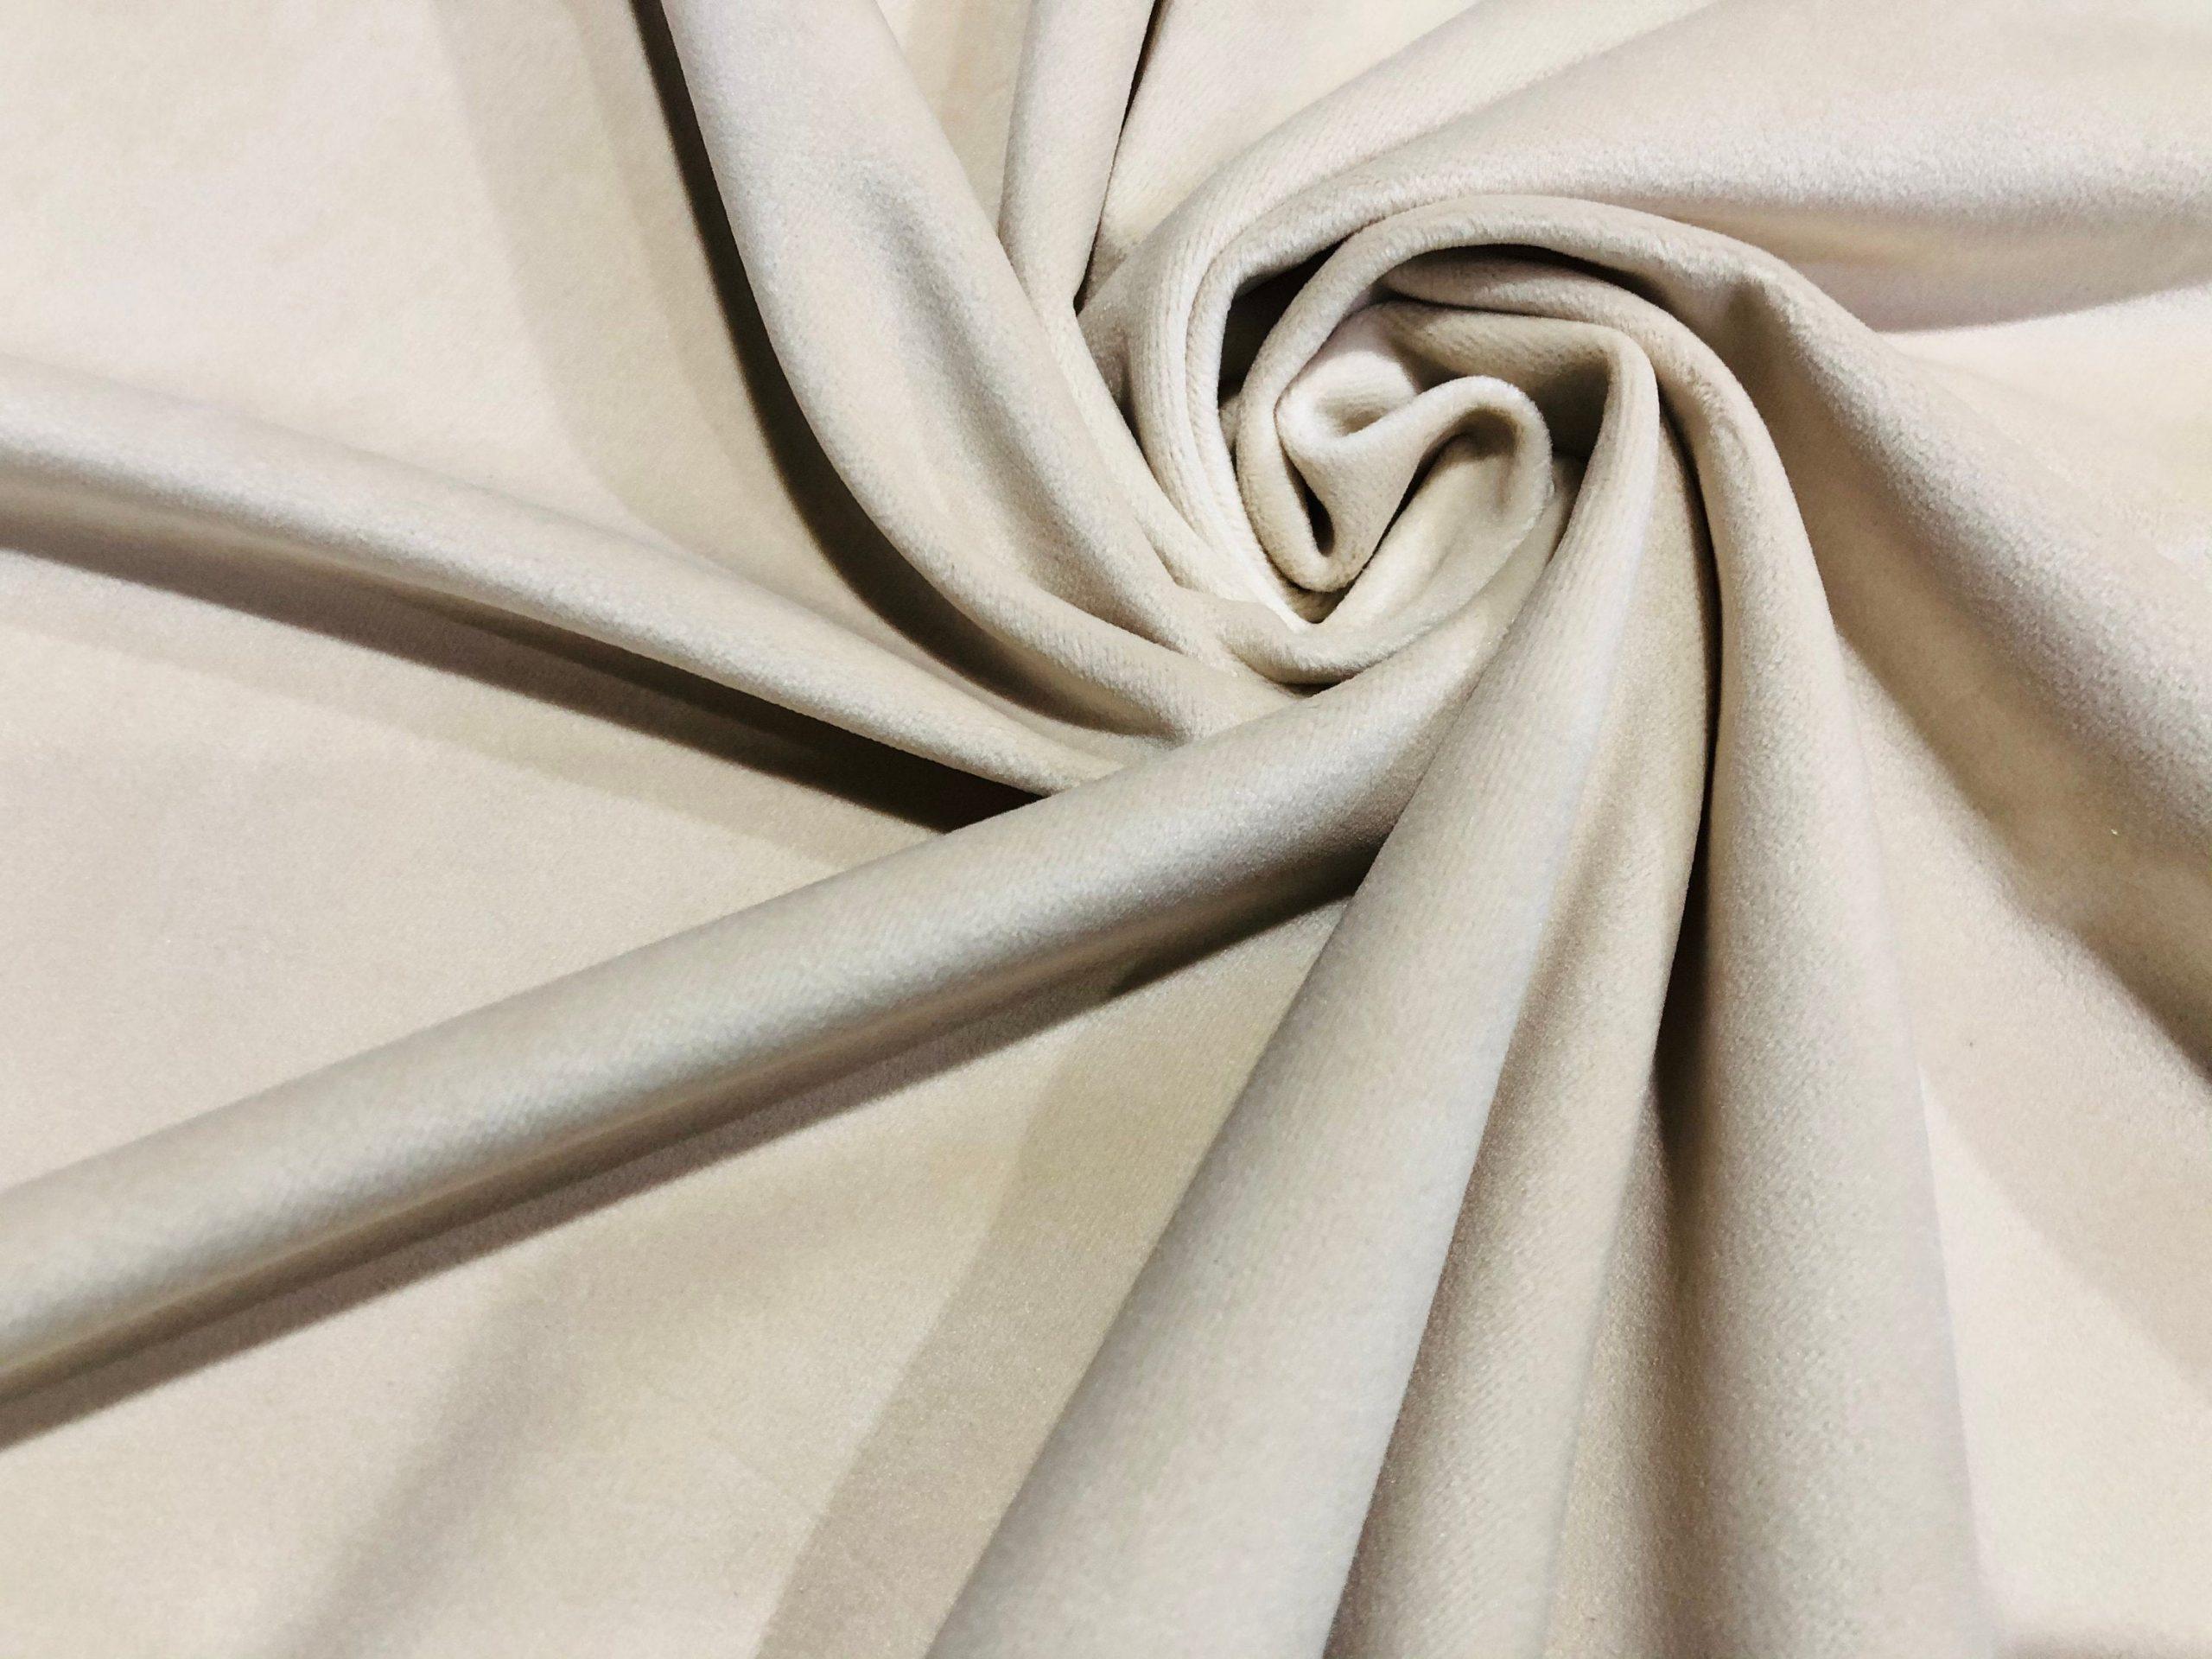 "LUX Velvet Fabric Super Soft Strong Velour Material Home Decor Curtains Upholstery Dressmaking – 59""/150 cm Wide – CREAM"